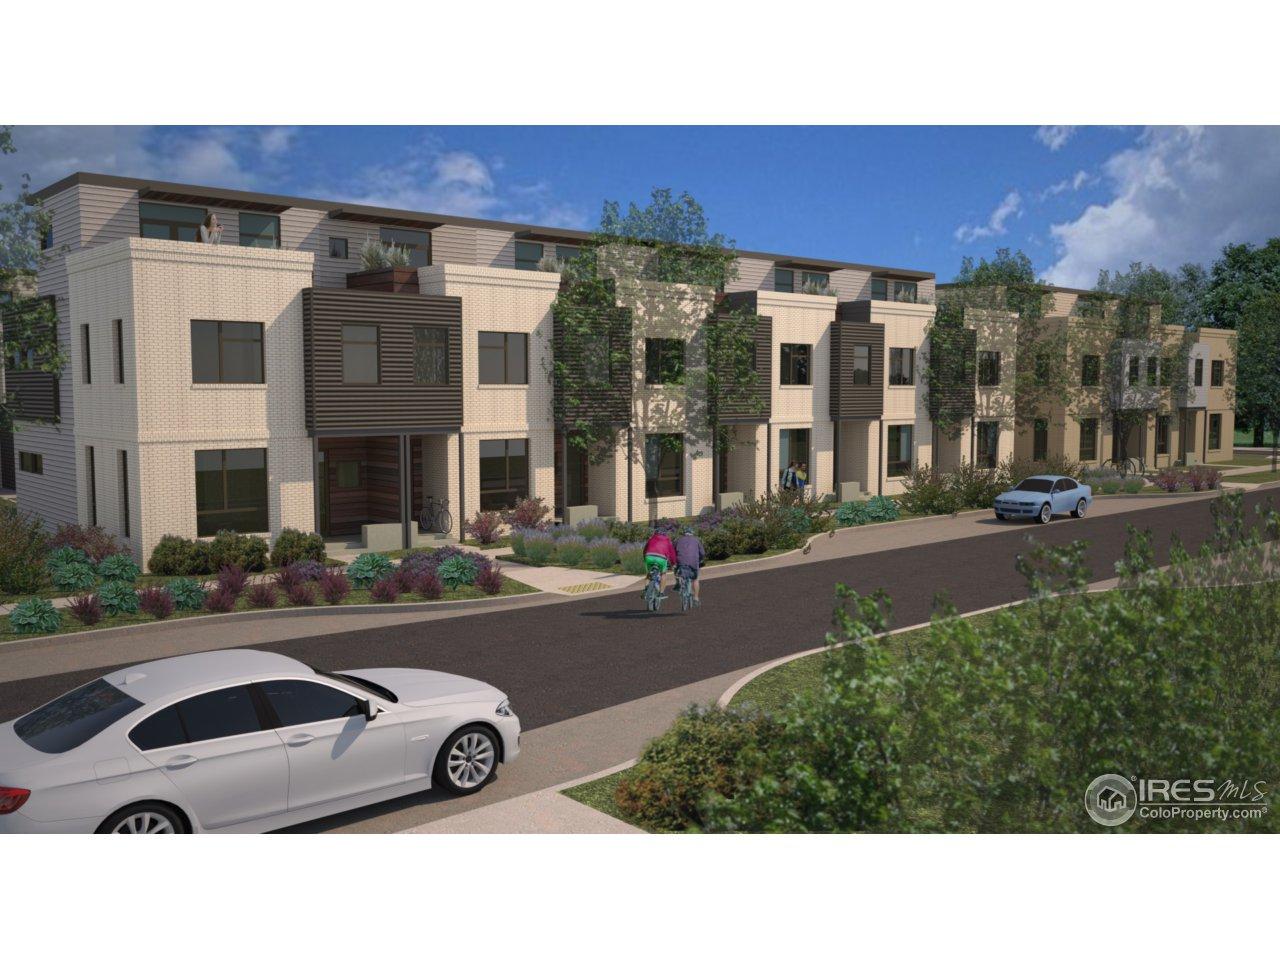 3101 Bluff St, Boulder CO 80301